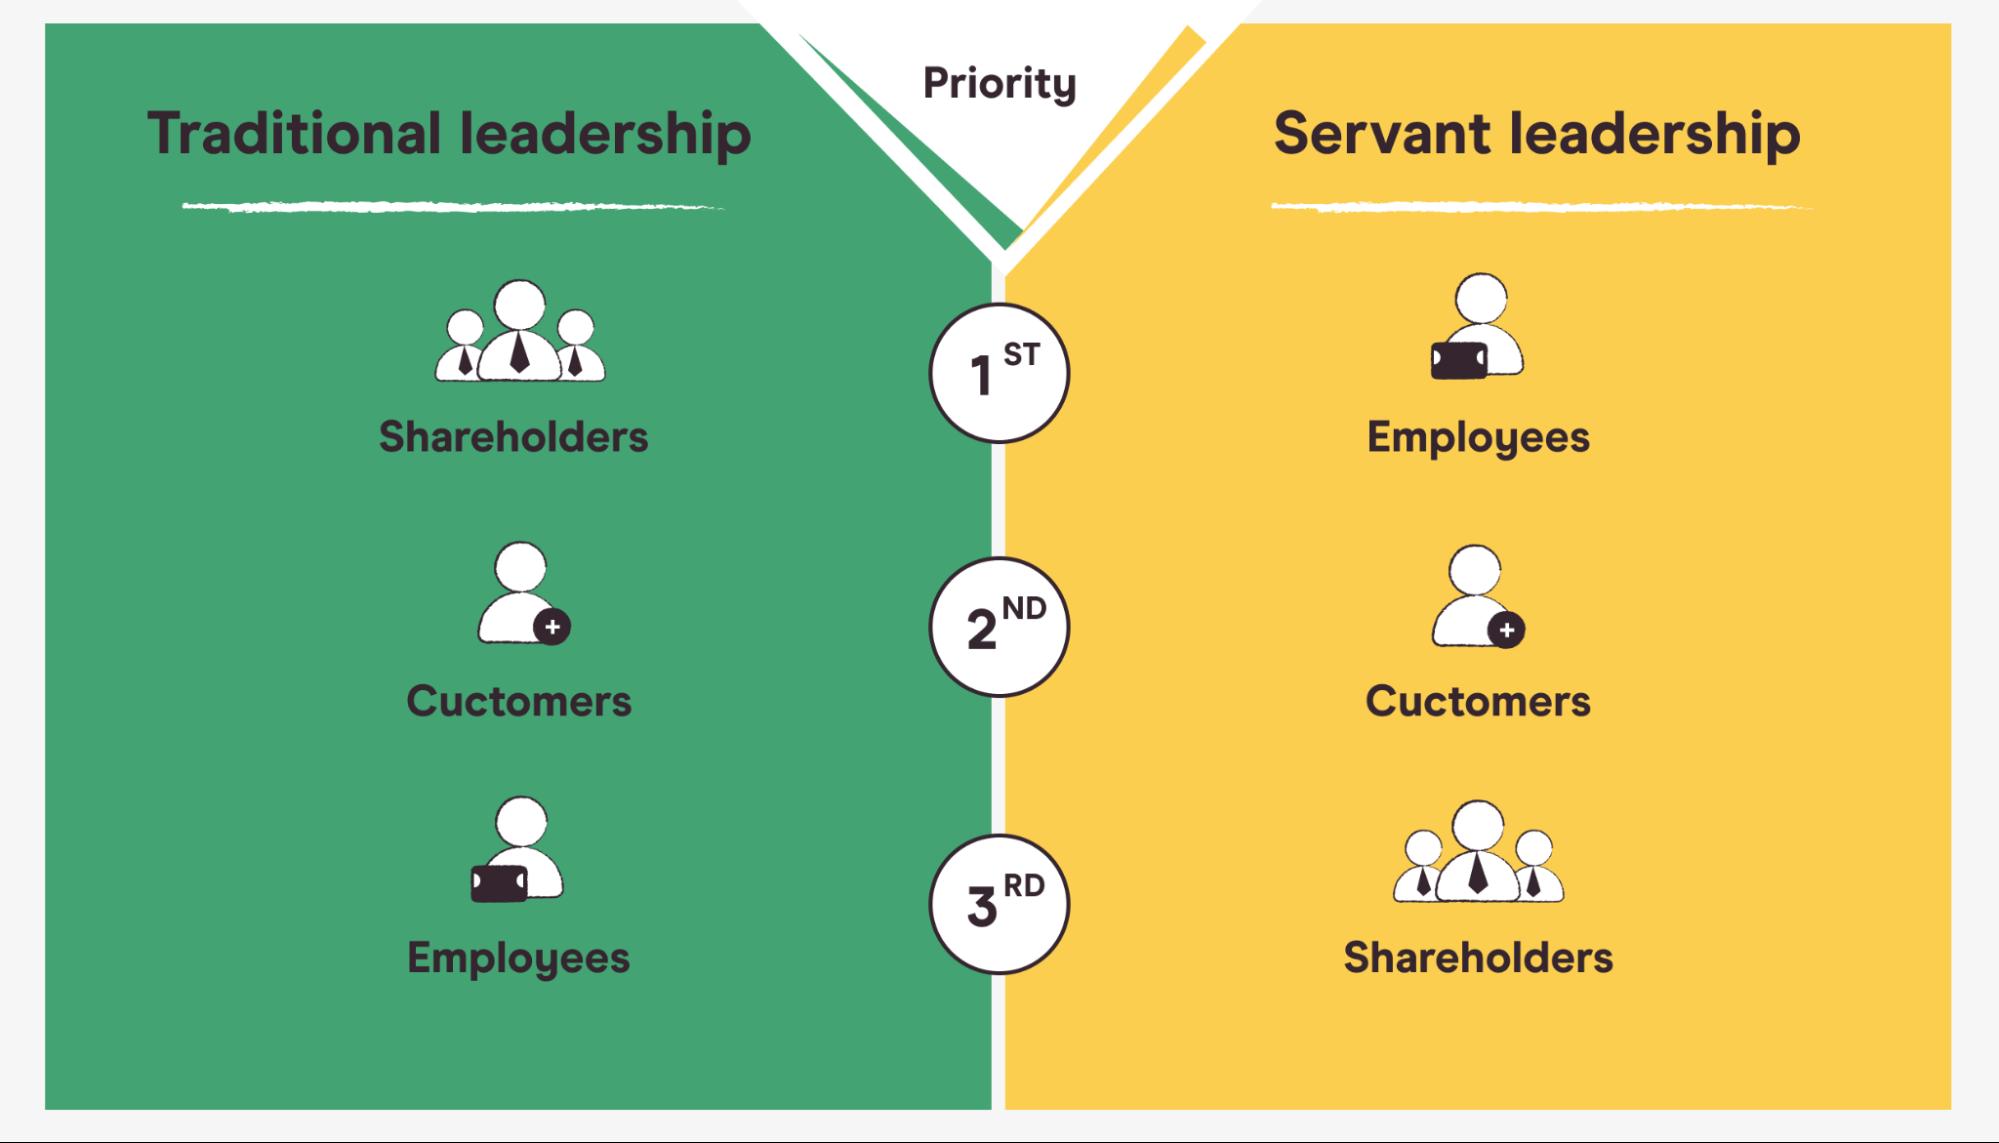 traditional leadership vs. servant leadership